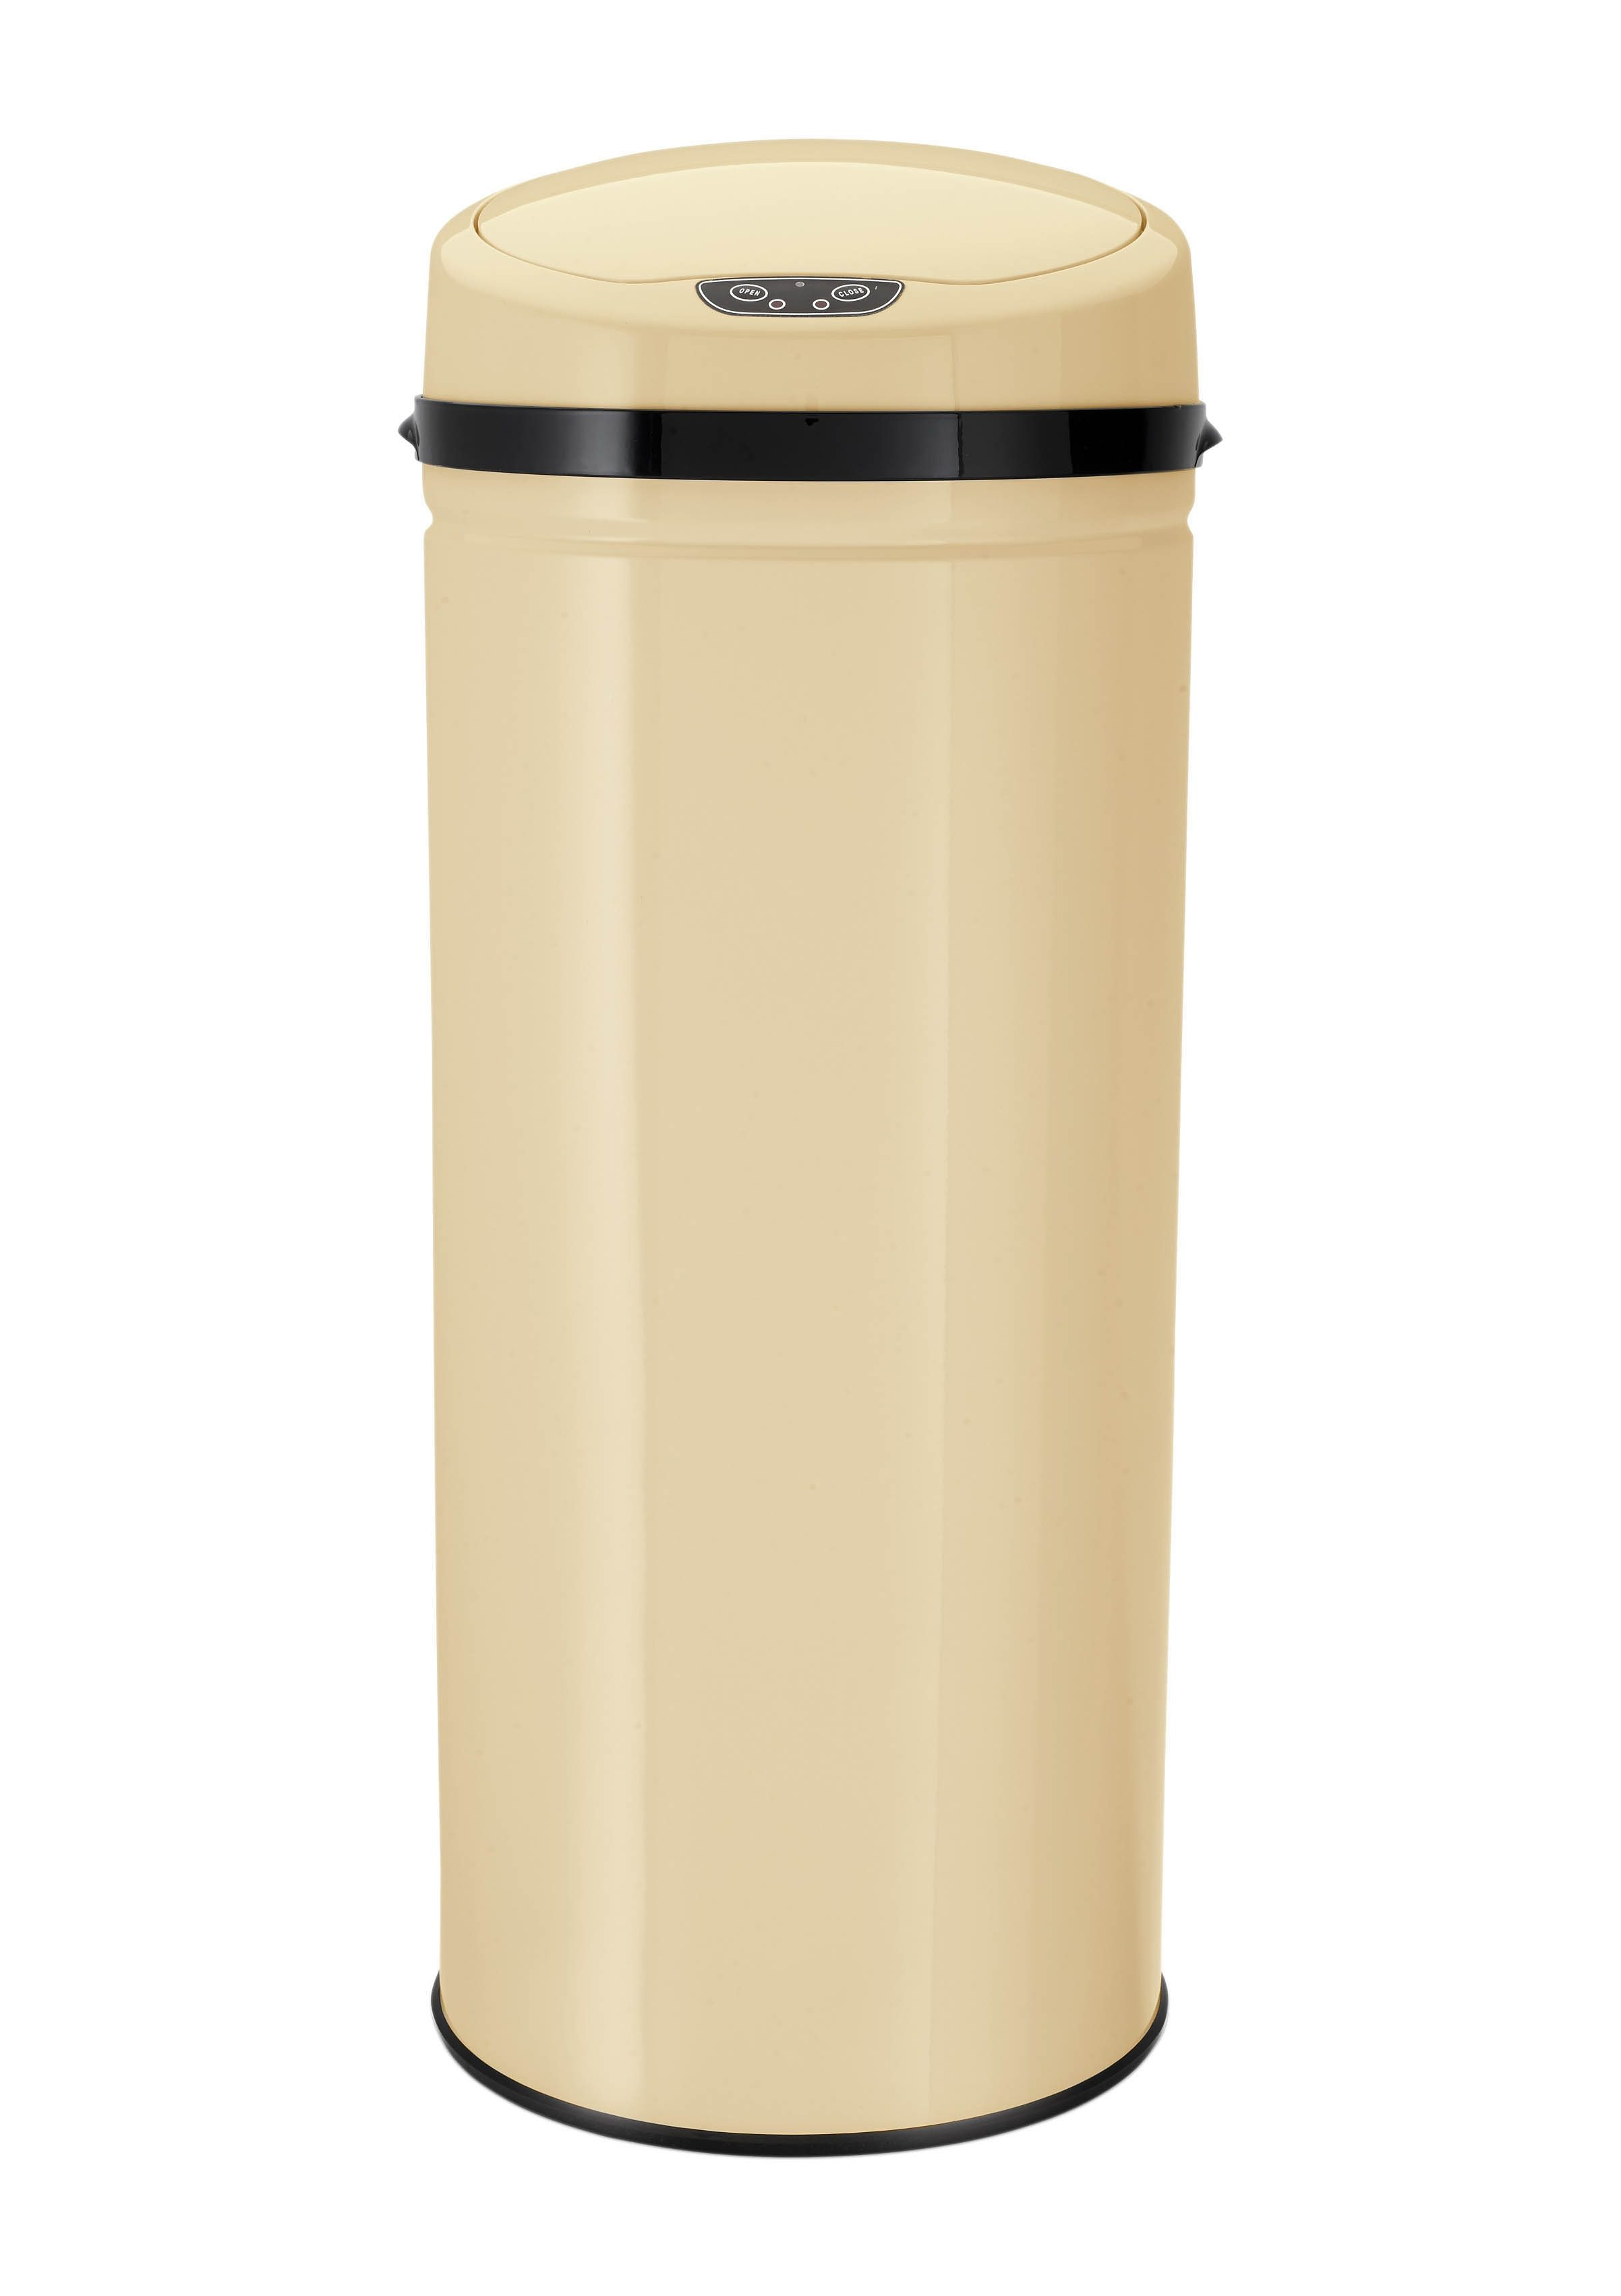 Edelstahl-Abfalleimer mit Infrarotsensor, 42 Liter, »INOX VANILLA«, Echtwerk